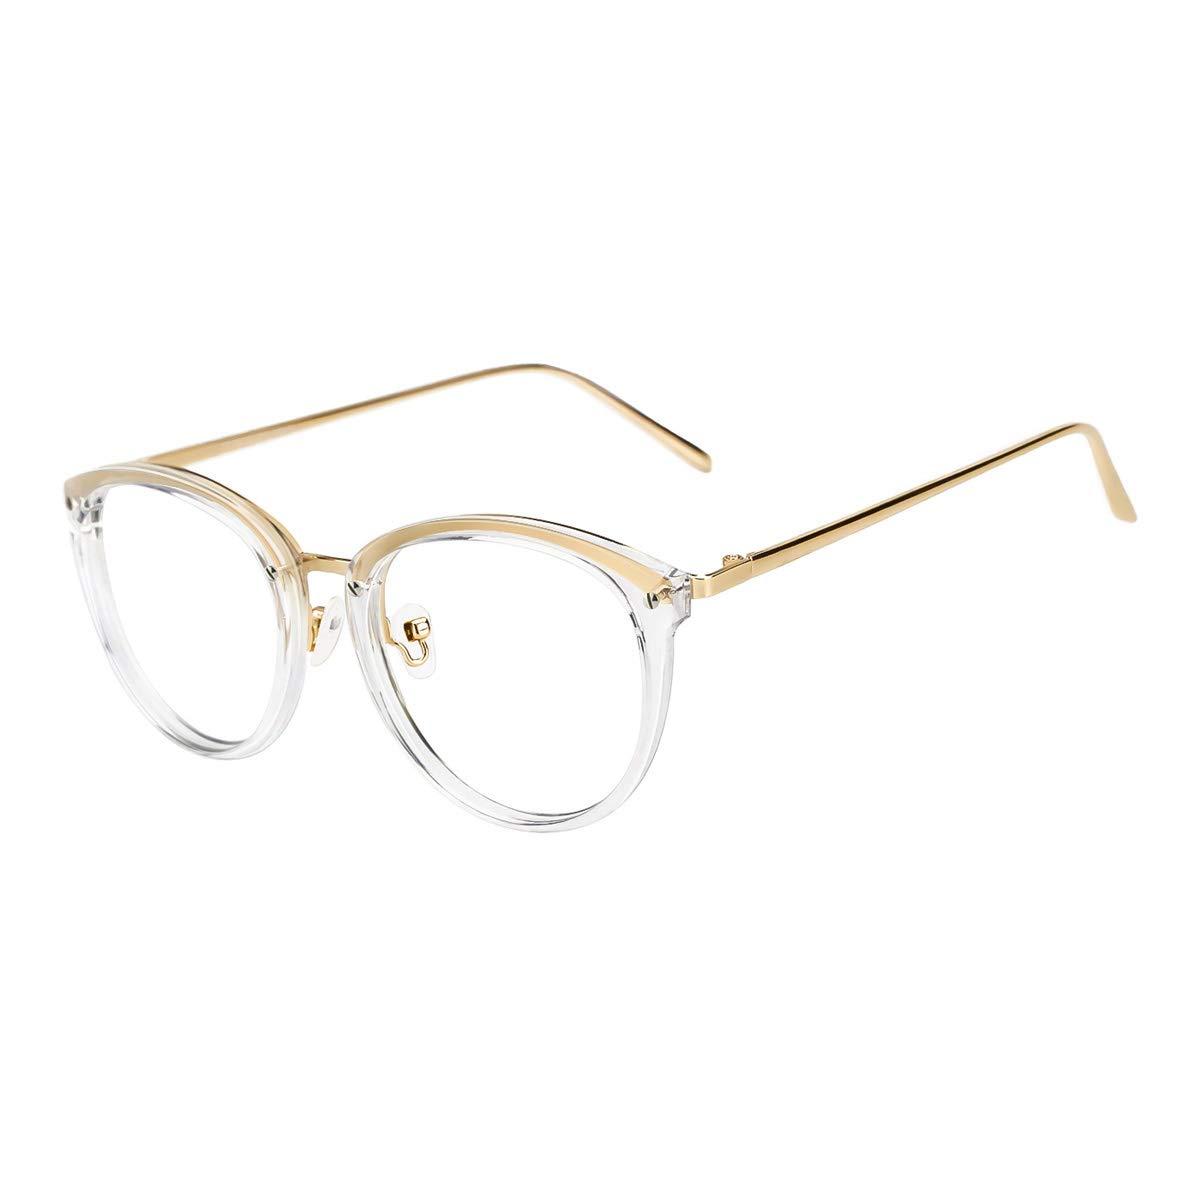 Vintage Round Eyewear Frame Non-prescription Glasses Clear Lens Eyewear